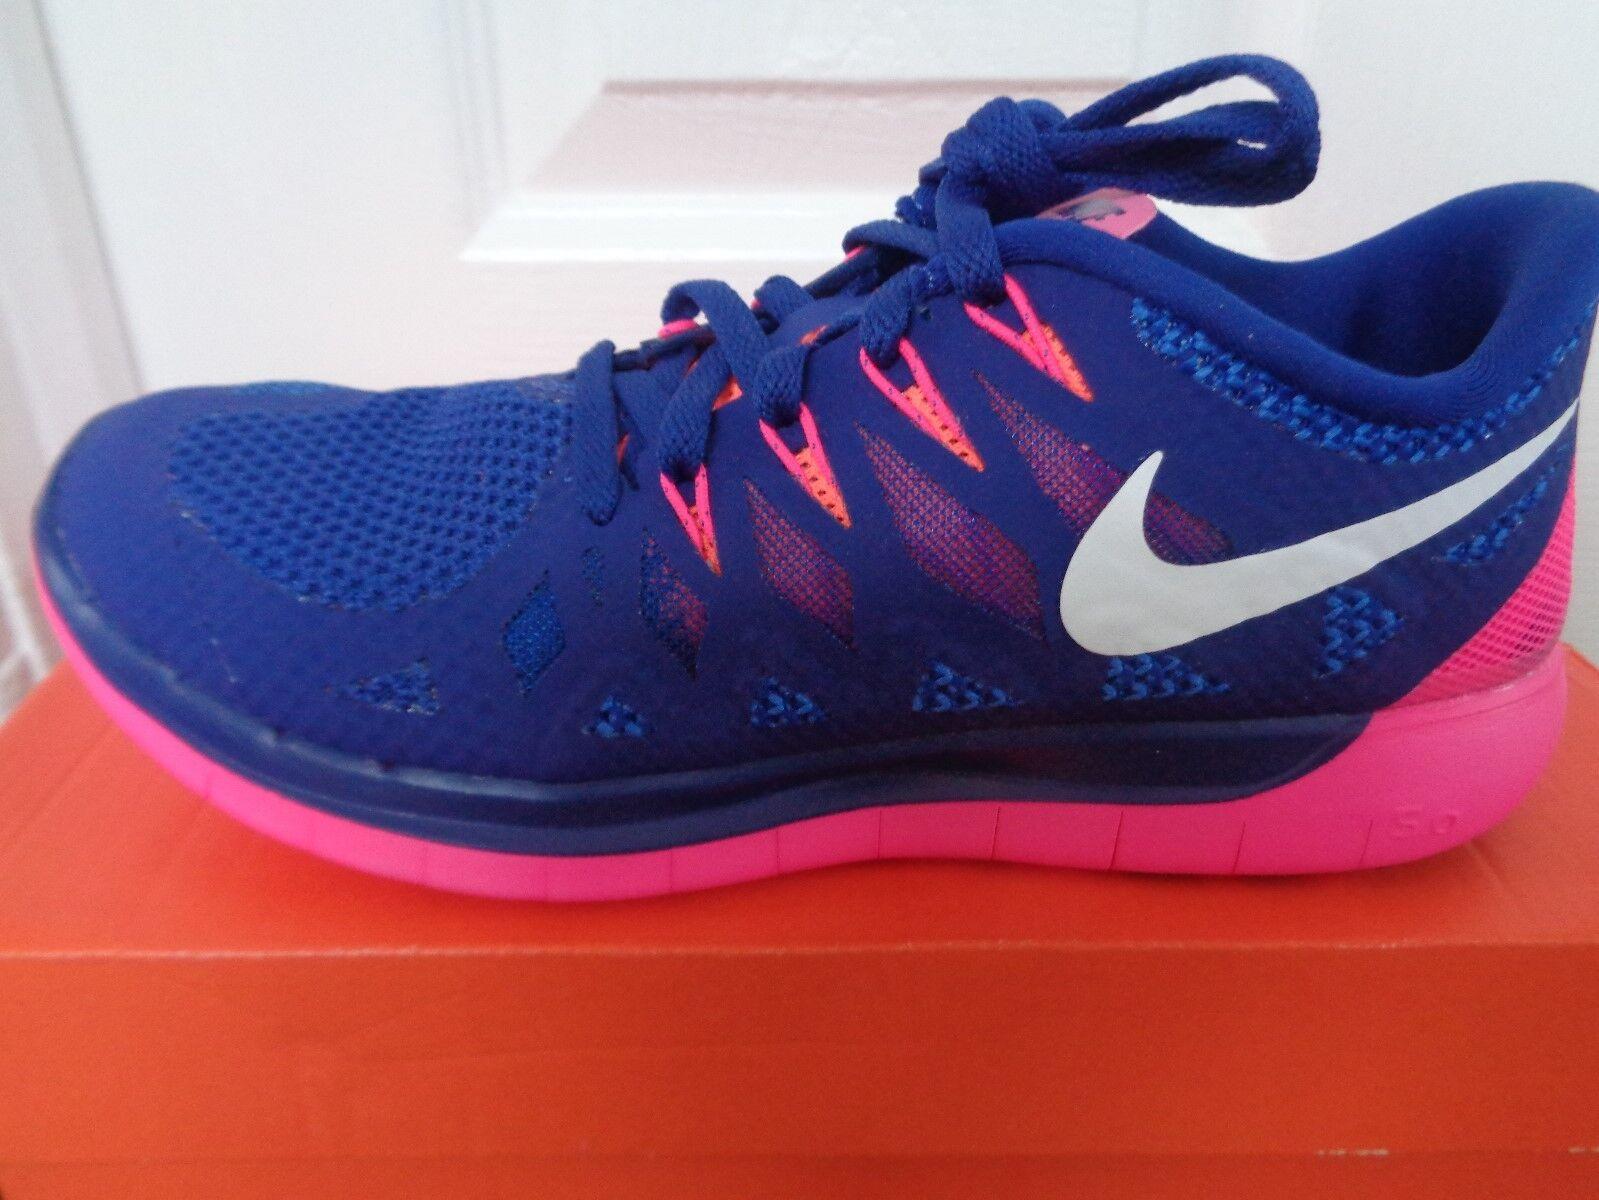 Nike Free 5.0  Femme  trainers sneakers 642199 401 uk 4 eu 37.5 us 6.5 NEW+BOX